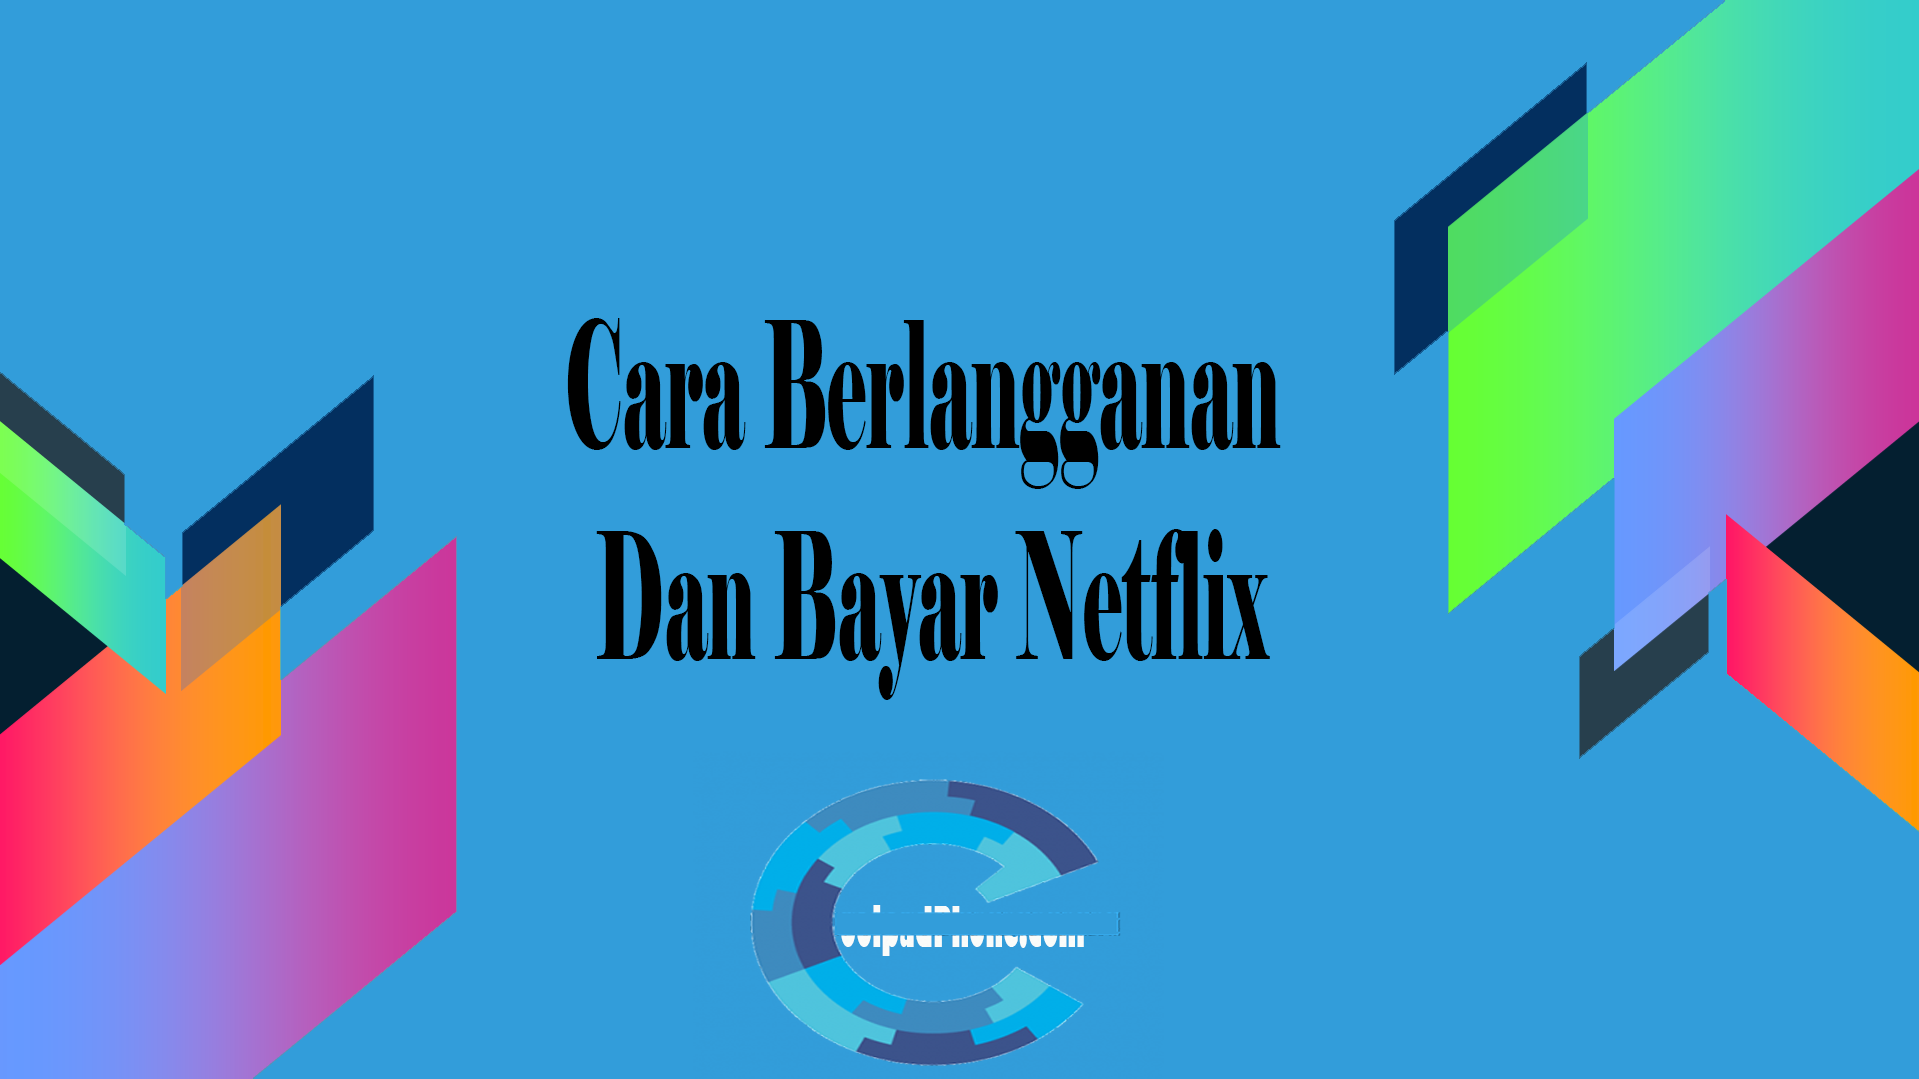 Cara Berlangganan Dan Bayar Netflix